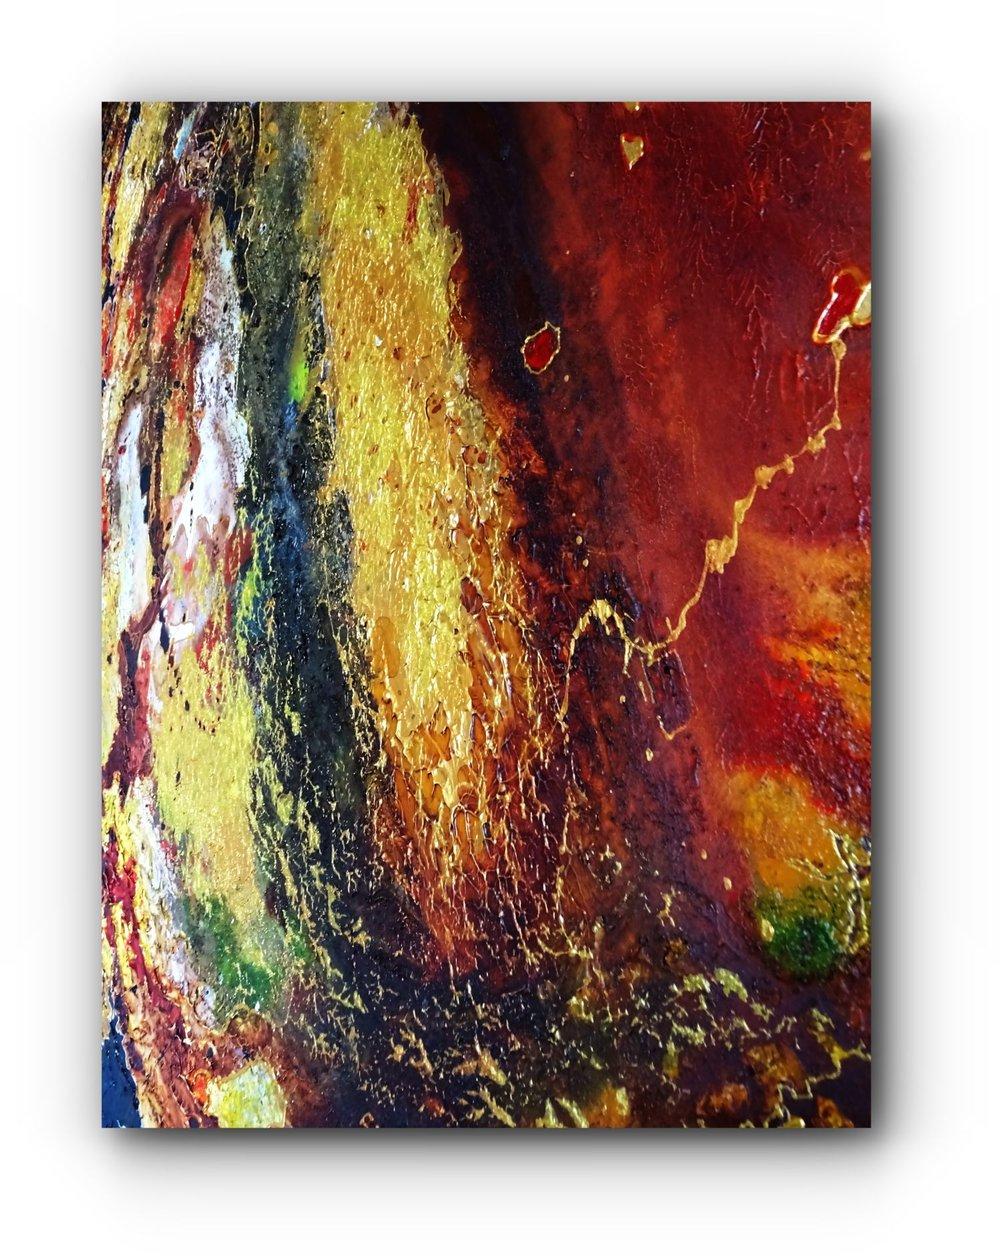 painting-detail-23-golden-sanctuary-artists-ingress-vortices.jpg